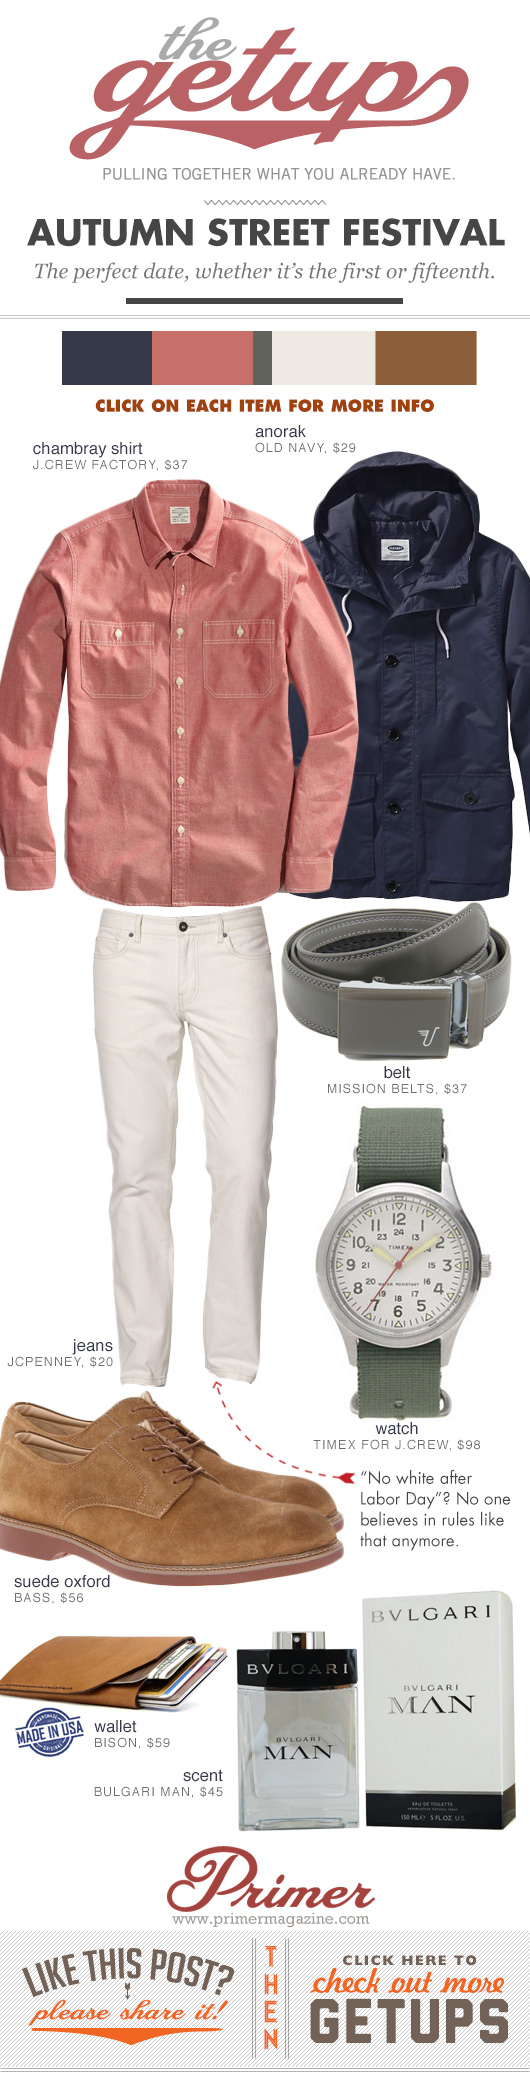 Getup Autumn Street Festival - Blue jacket, pink shirt, white jeans